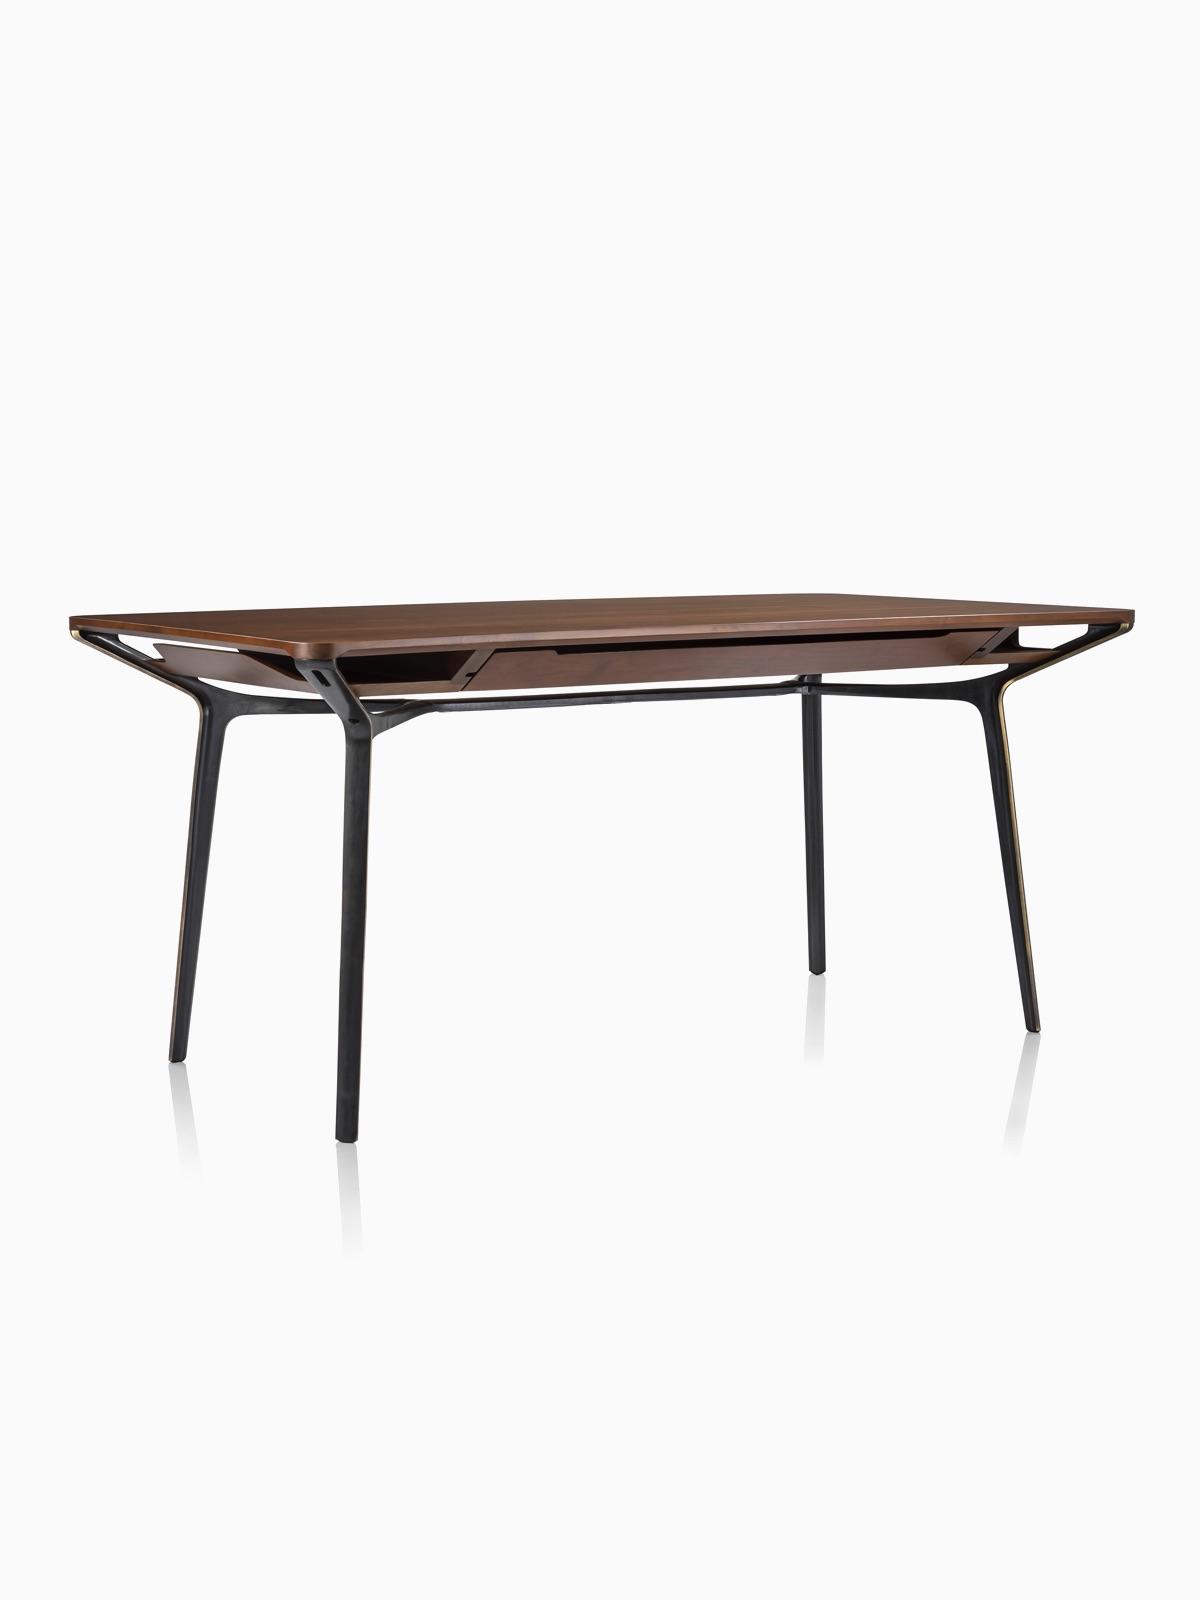 Dining Tables Herman Miller